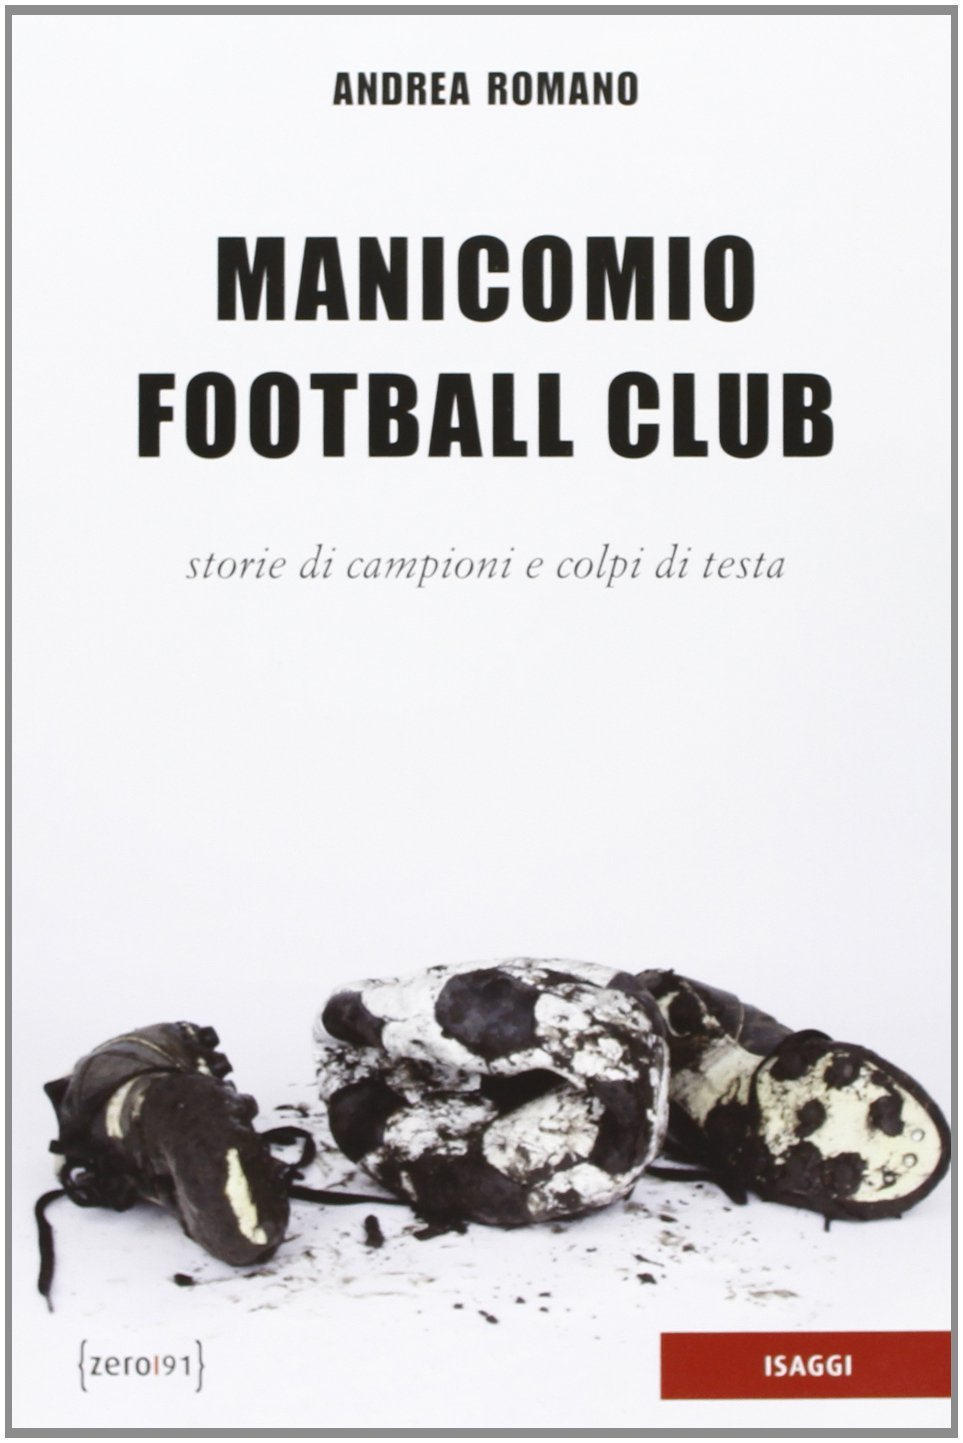 Andrea Romano Manicomio Football Club.